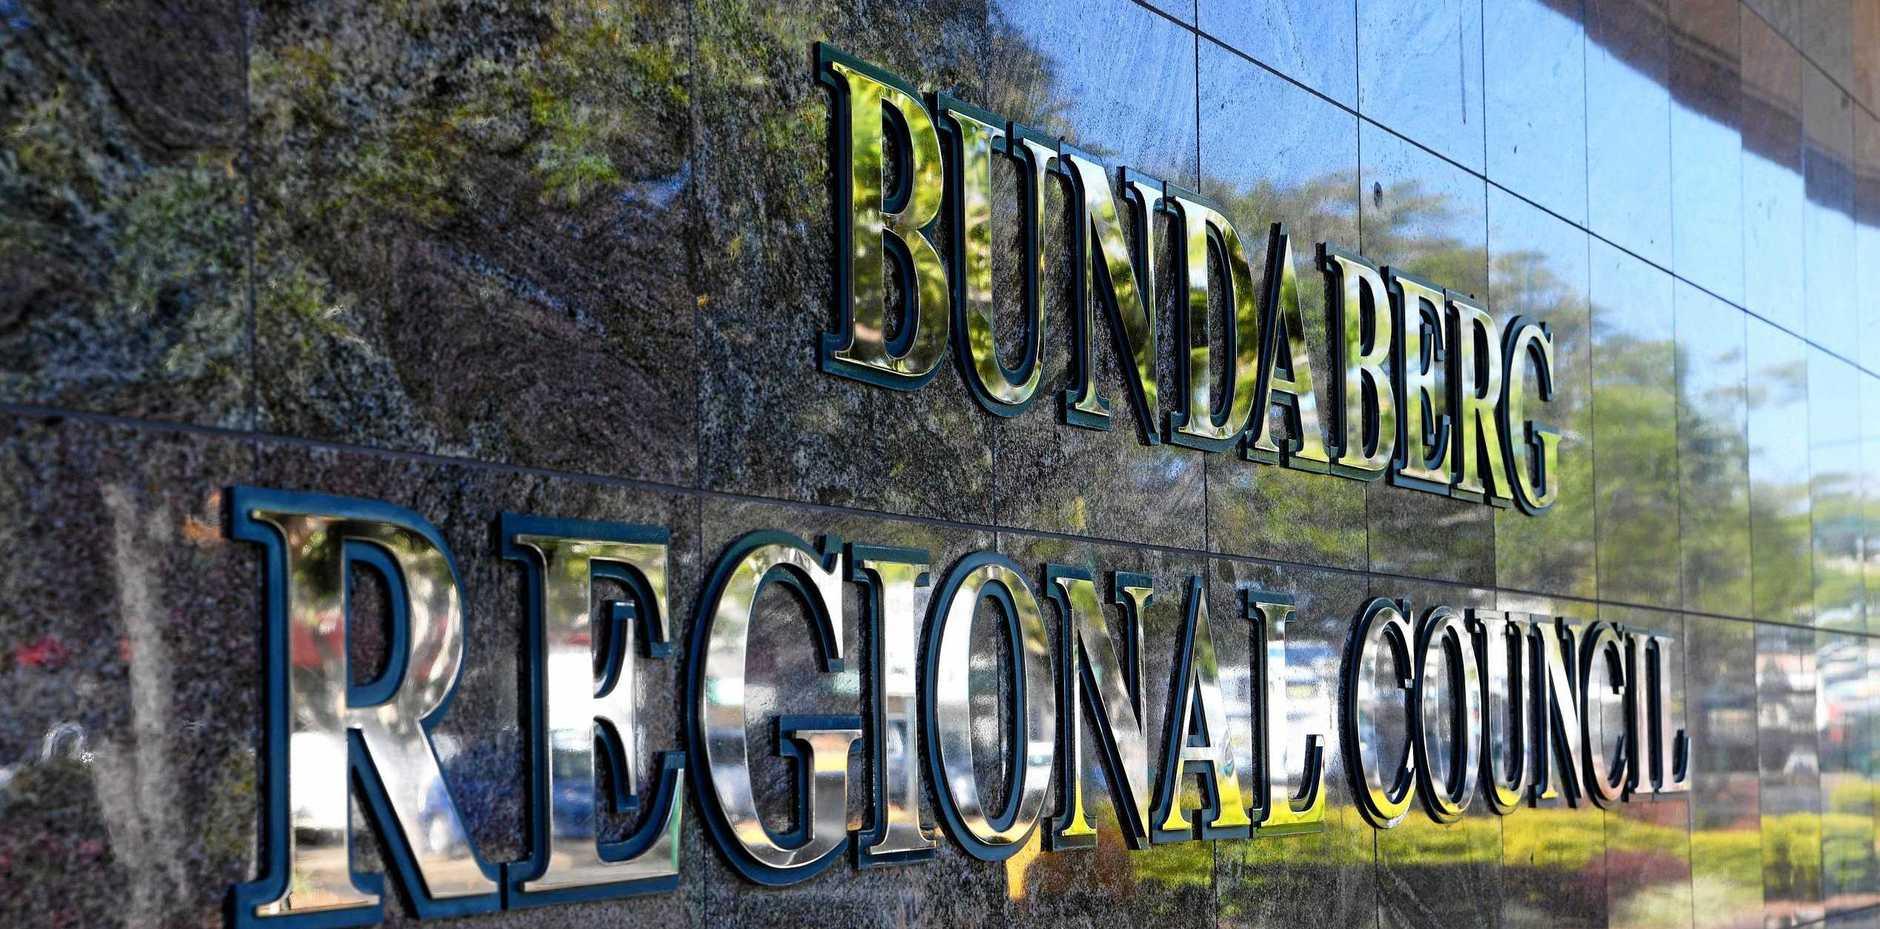 Bundaberg Regional Council.